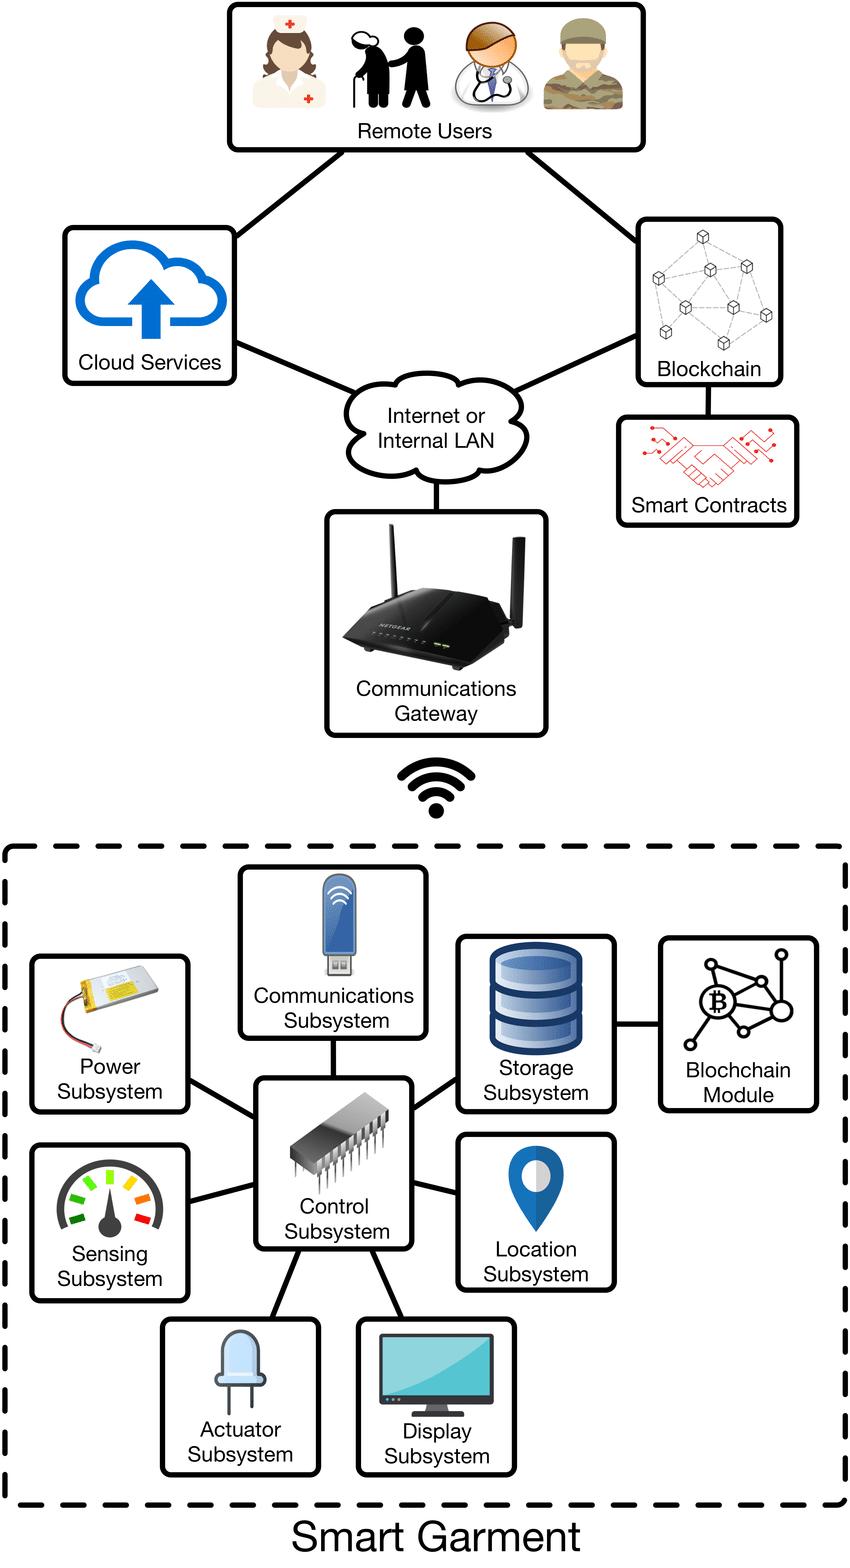 medium resolution of generic architecture of an iot smart garment system download scientific diagram